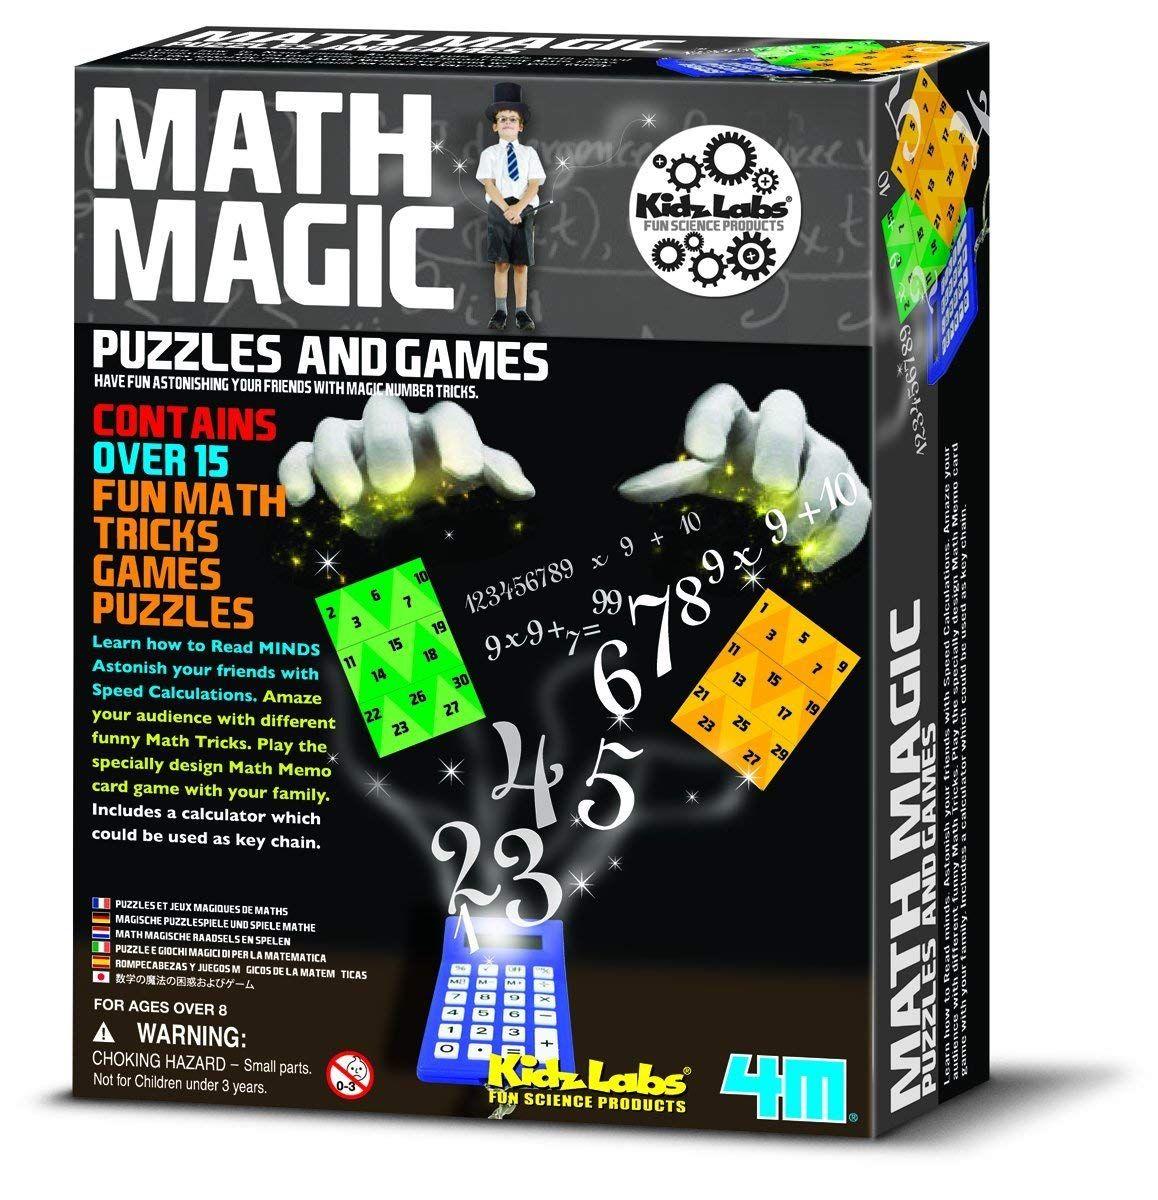 Best Science Toys For Kids Stem Skills Brain Growth Math Magic Fun Math Educational Games For Teens